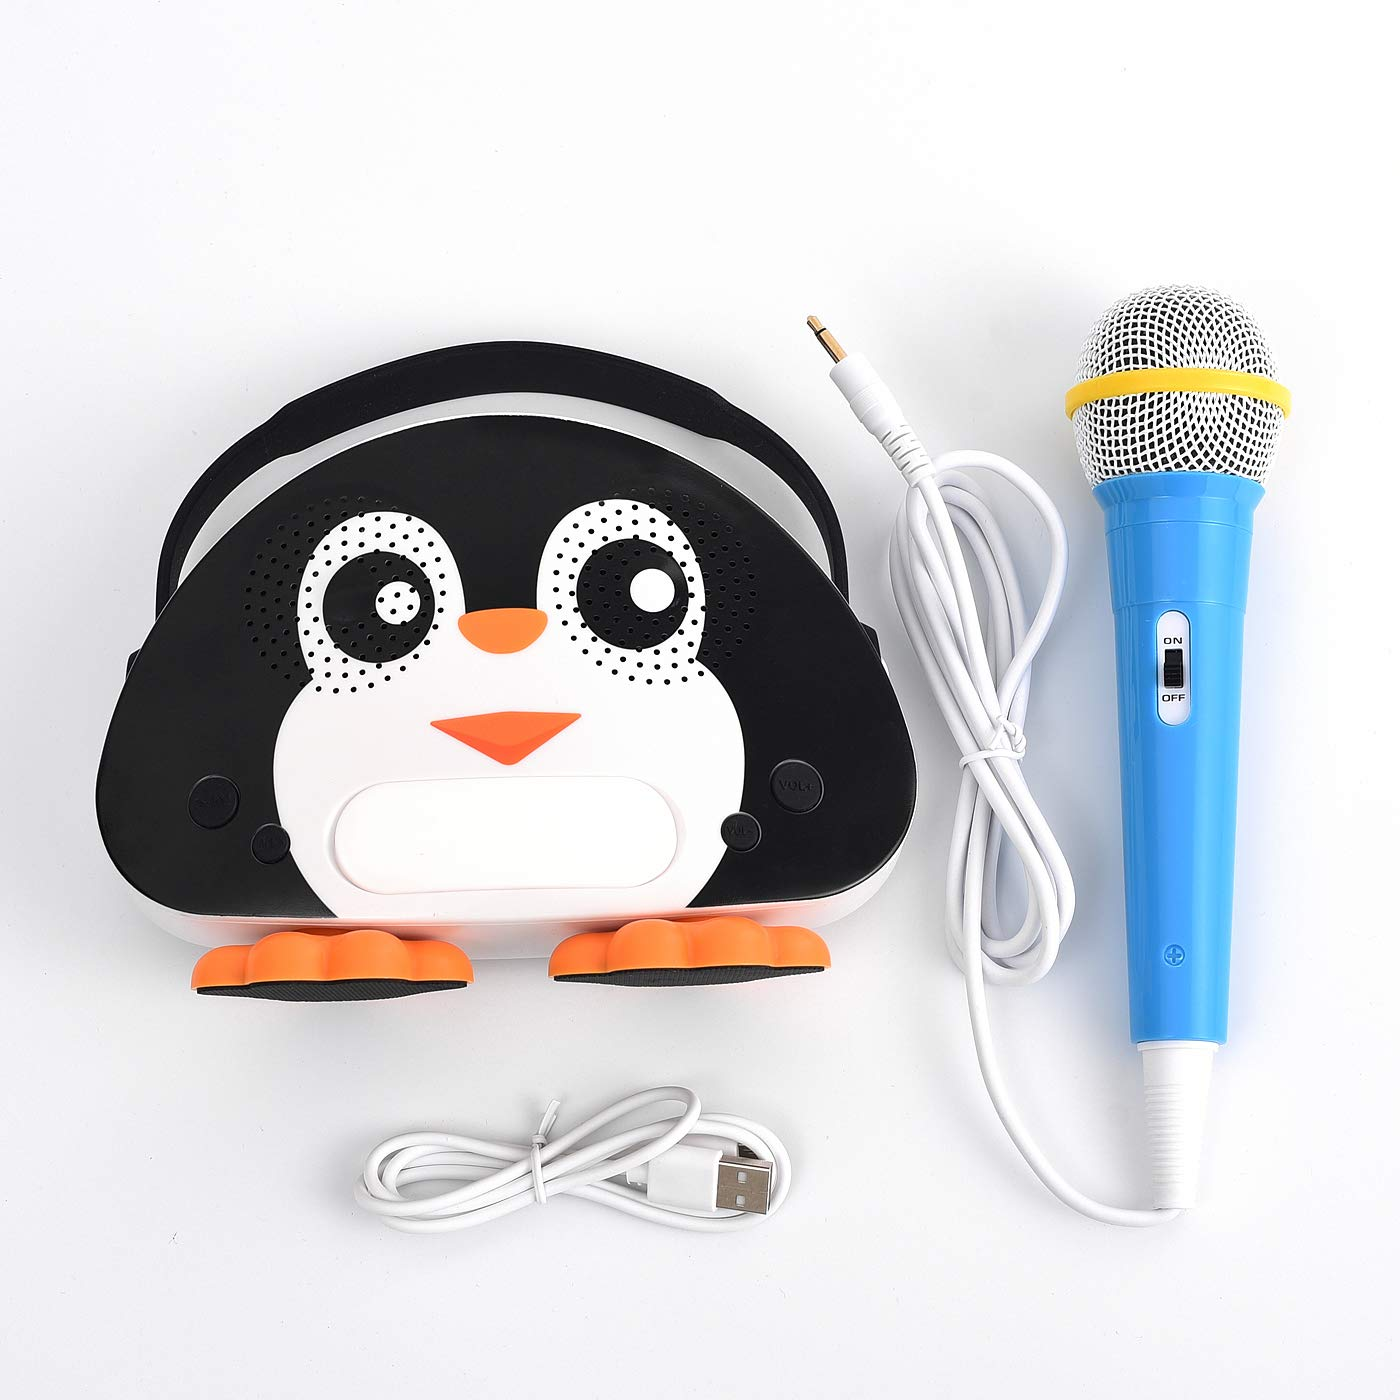 HowQ Outdoor Toys Karaoke Machine , Portable Kids Karaoke Bluetooth Speaker Wireless Cartoon Speaker for Kids for Indoor Toys Travel Activities with Microphone Penguin Karaoke Machine(Black-White) by HowQ (Image #4)